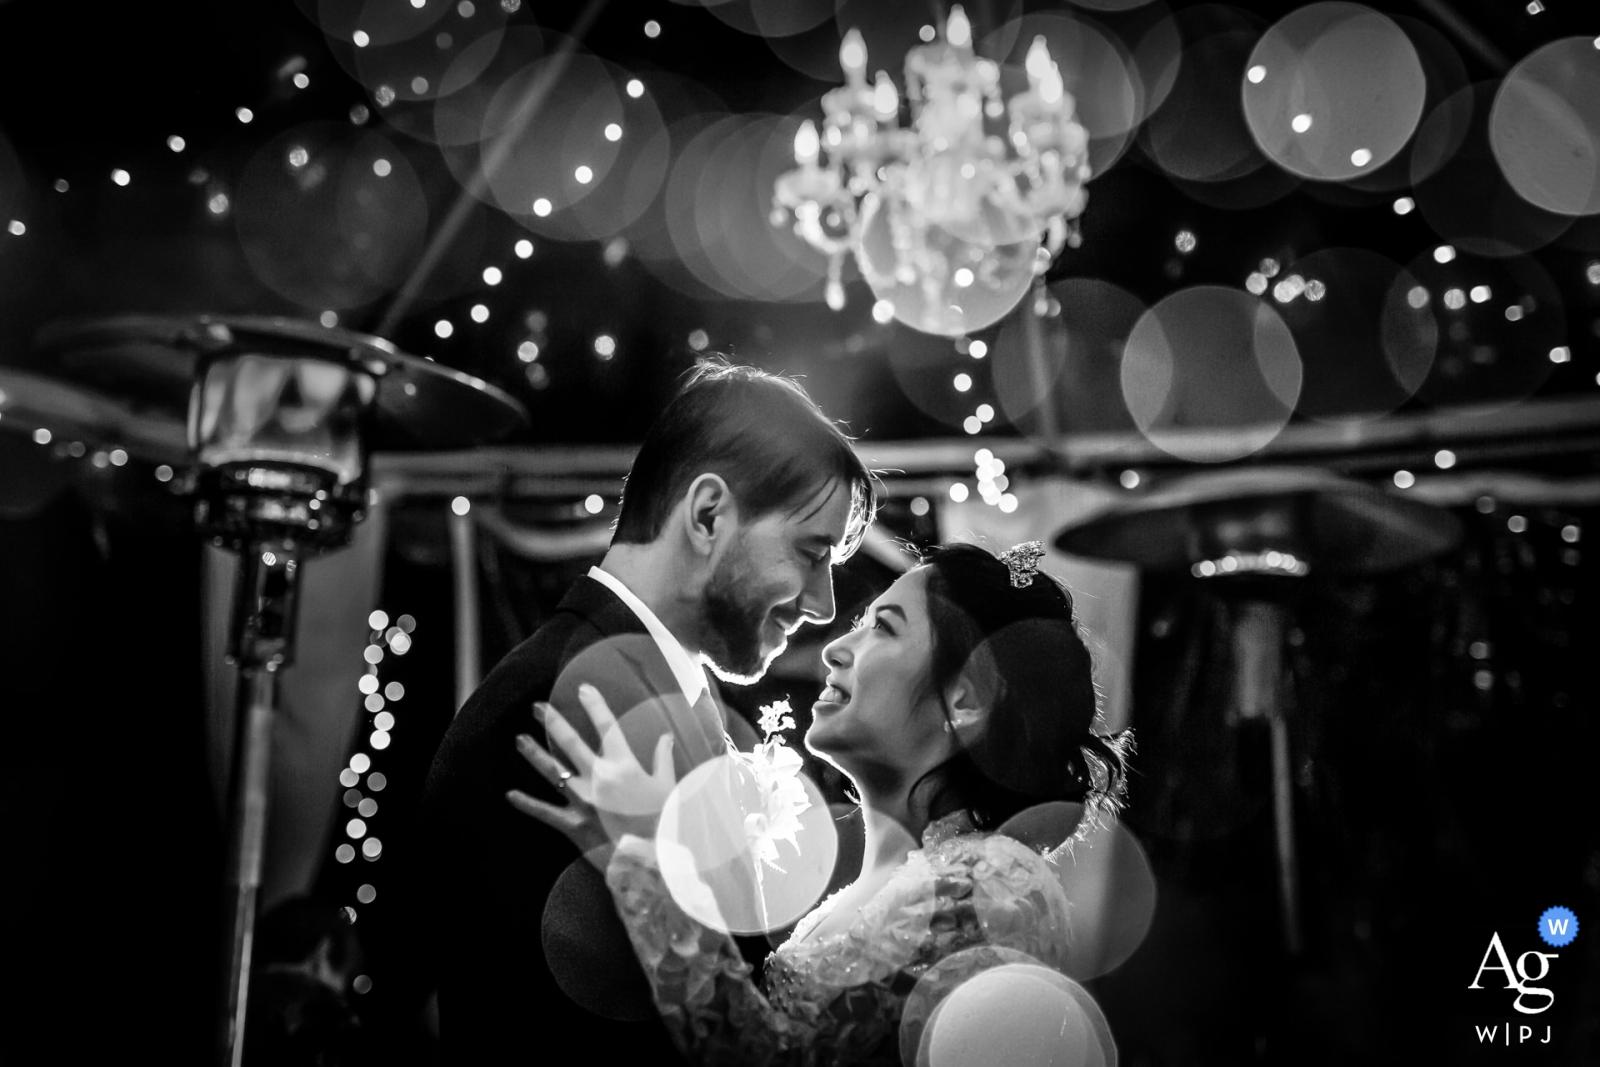 Inn of the Seventh Ray, Topanga, CA - Night Bokeh wedding photo from the dance floor